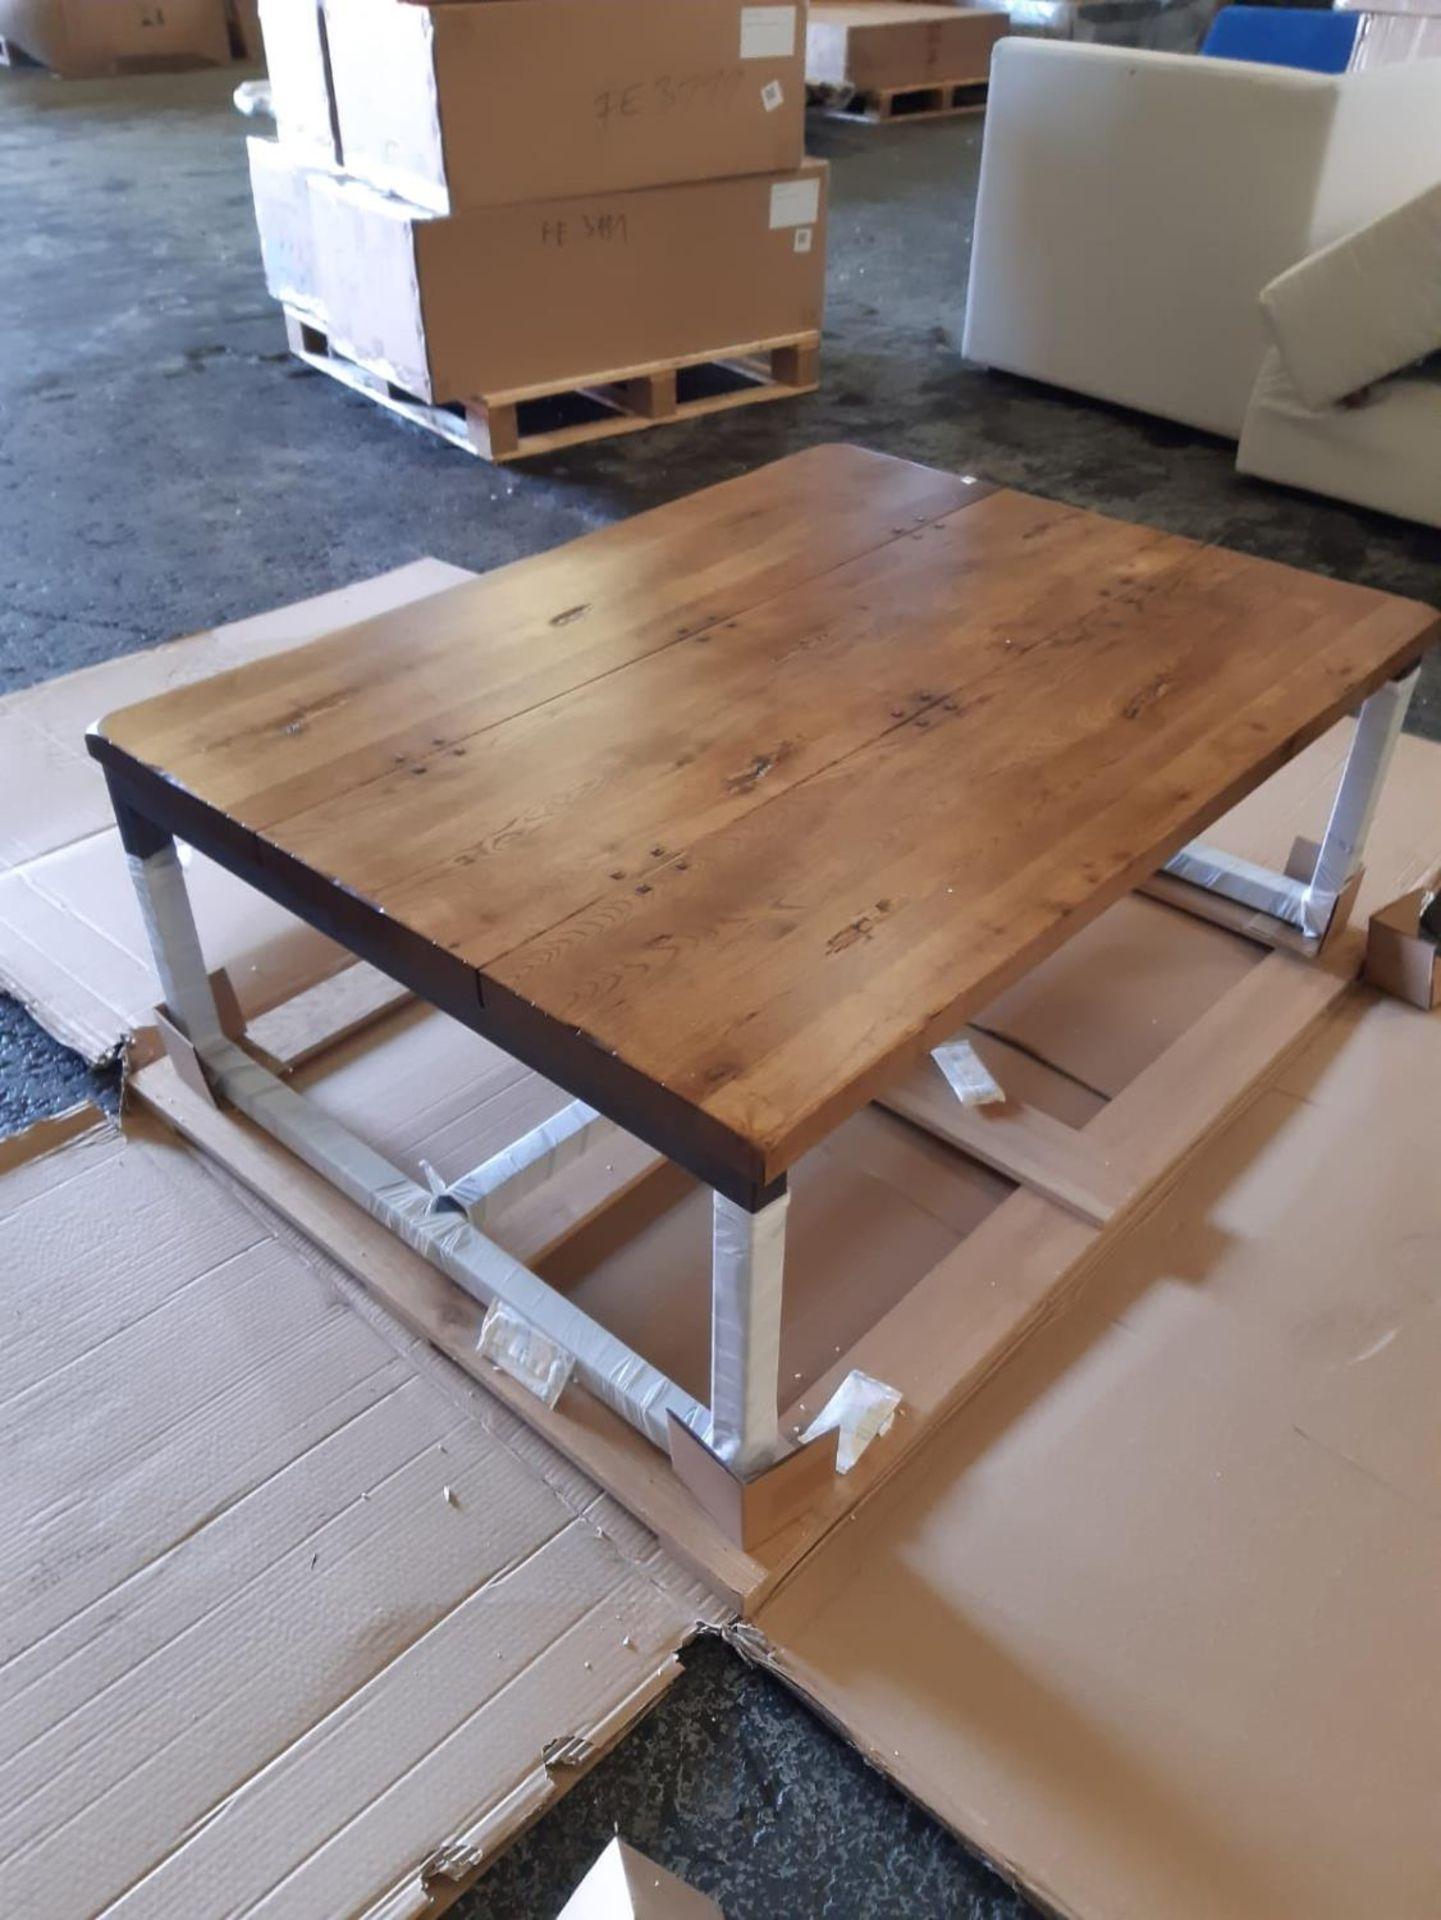 A BARBICAN COFFEE TABLE - SALOON & IRON 183cm x 122cm x 45cm (rrp £1225)